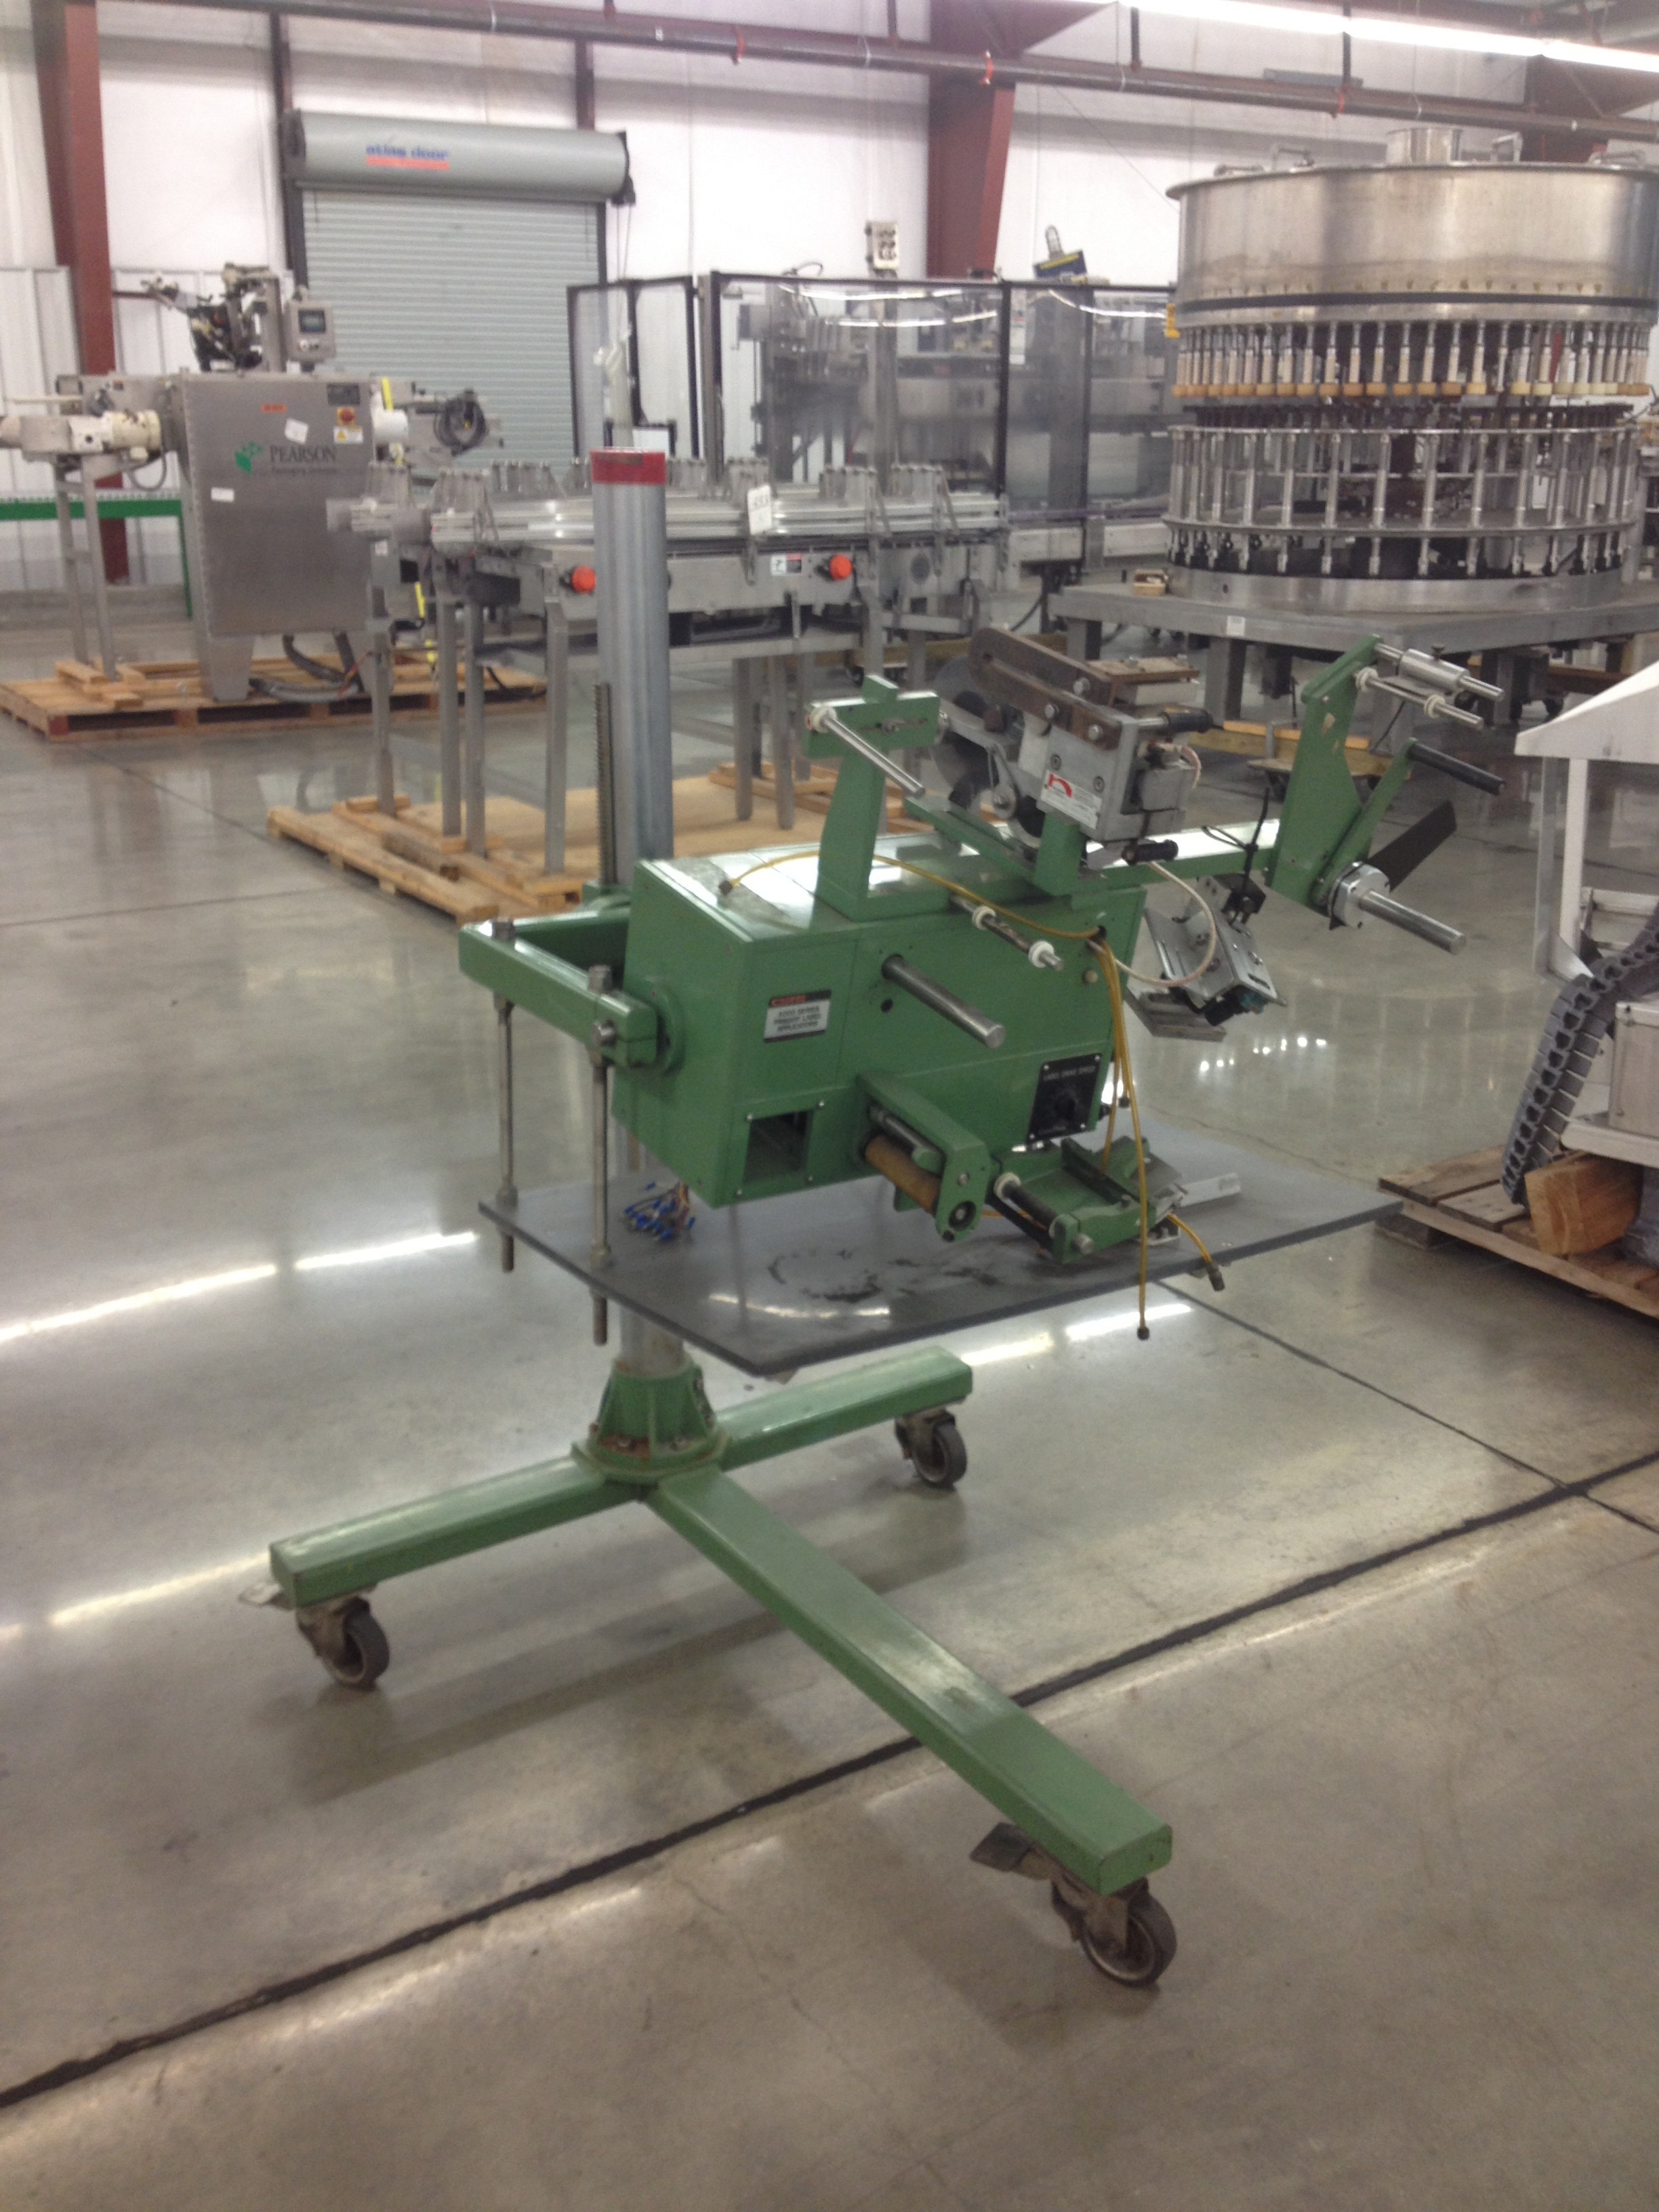 Lot 15 - Camtron Portable Pressure Sensitive Carton Labeler